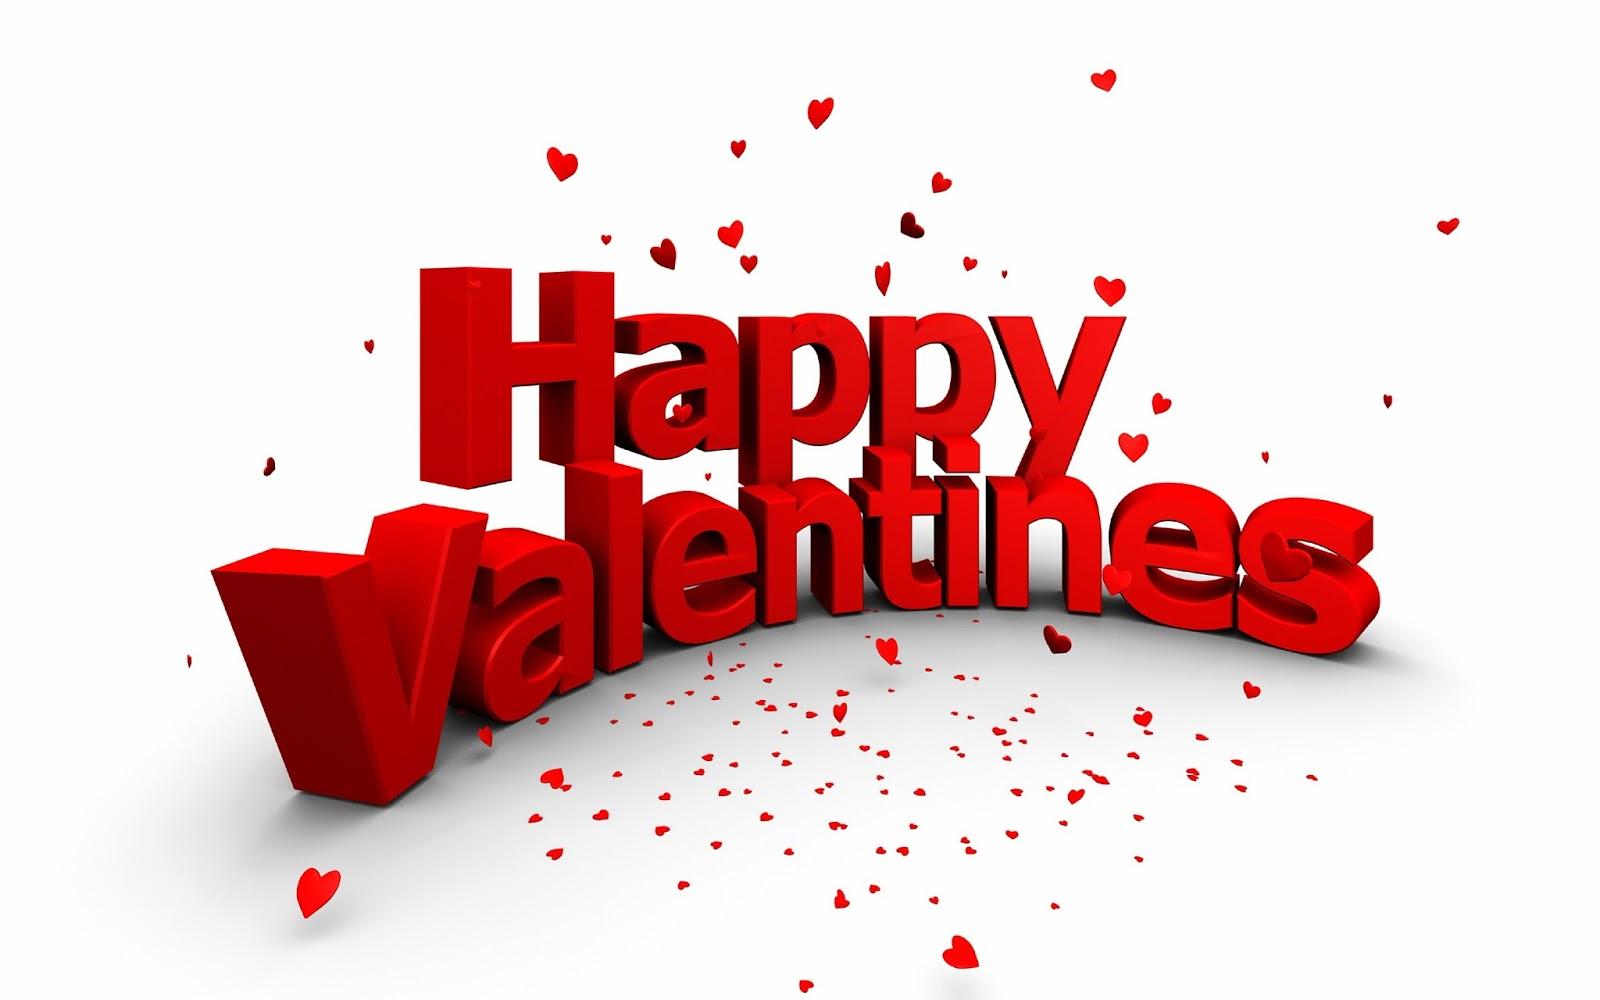 30 Kata Kata Ucapan Selamat Hari Valentine 2018 Terbaik SANGAT BIJAK